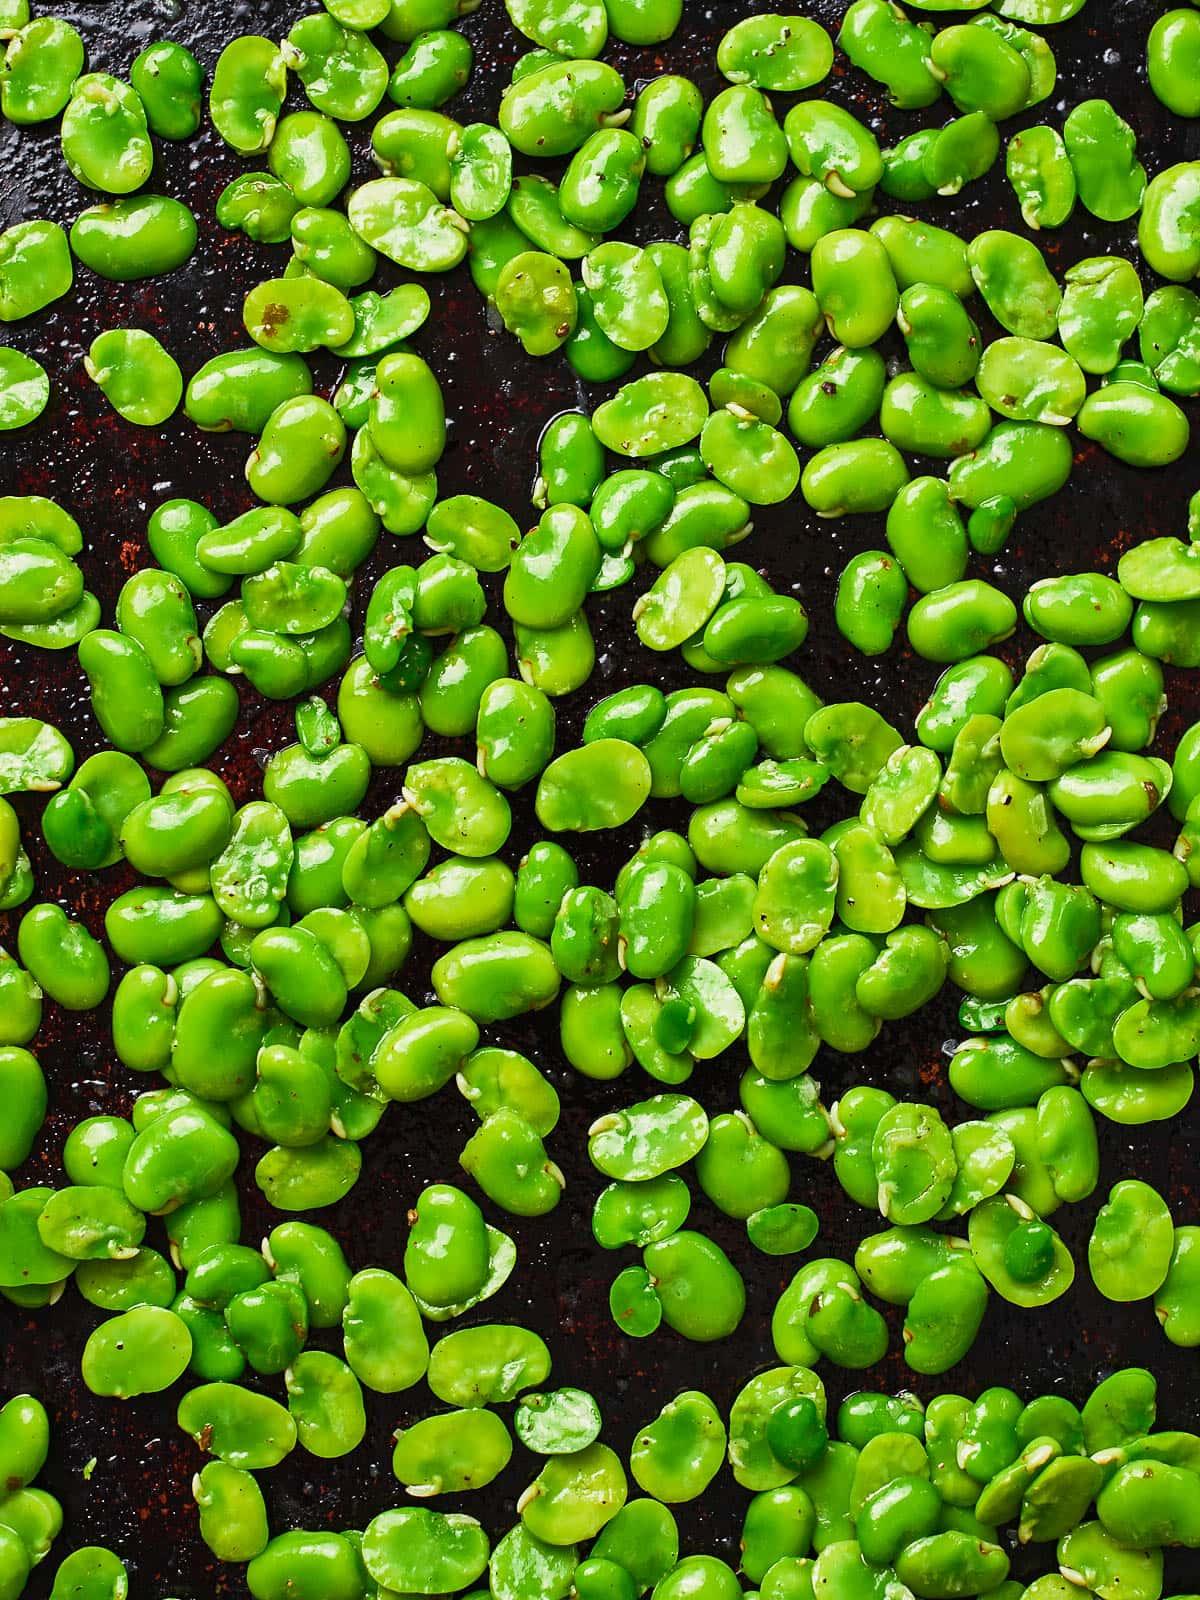 Broad beans after massage